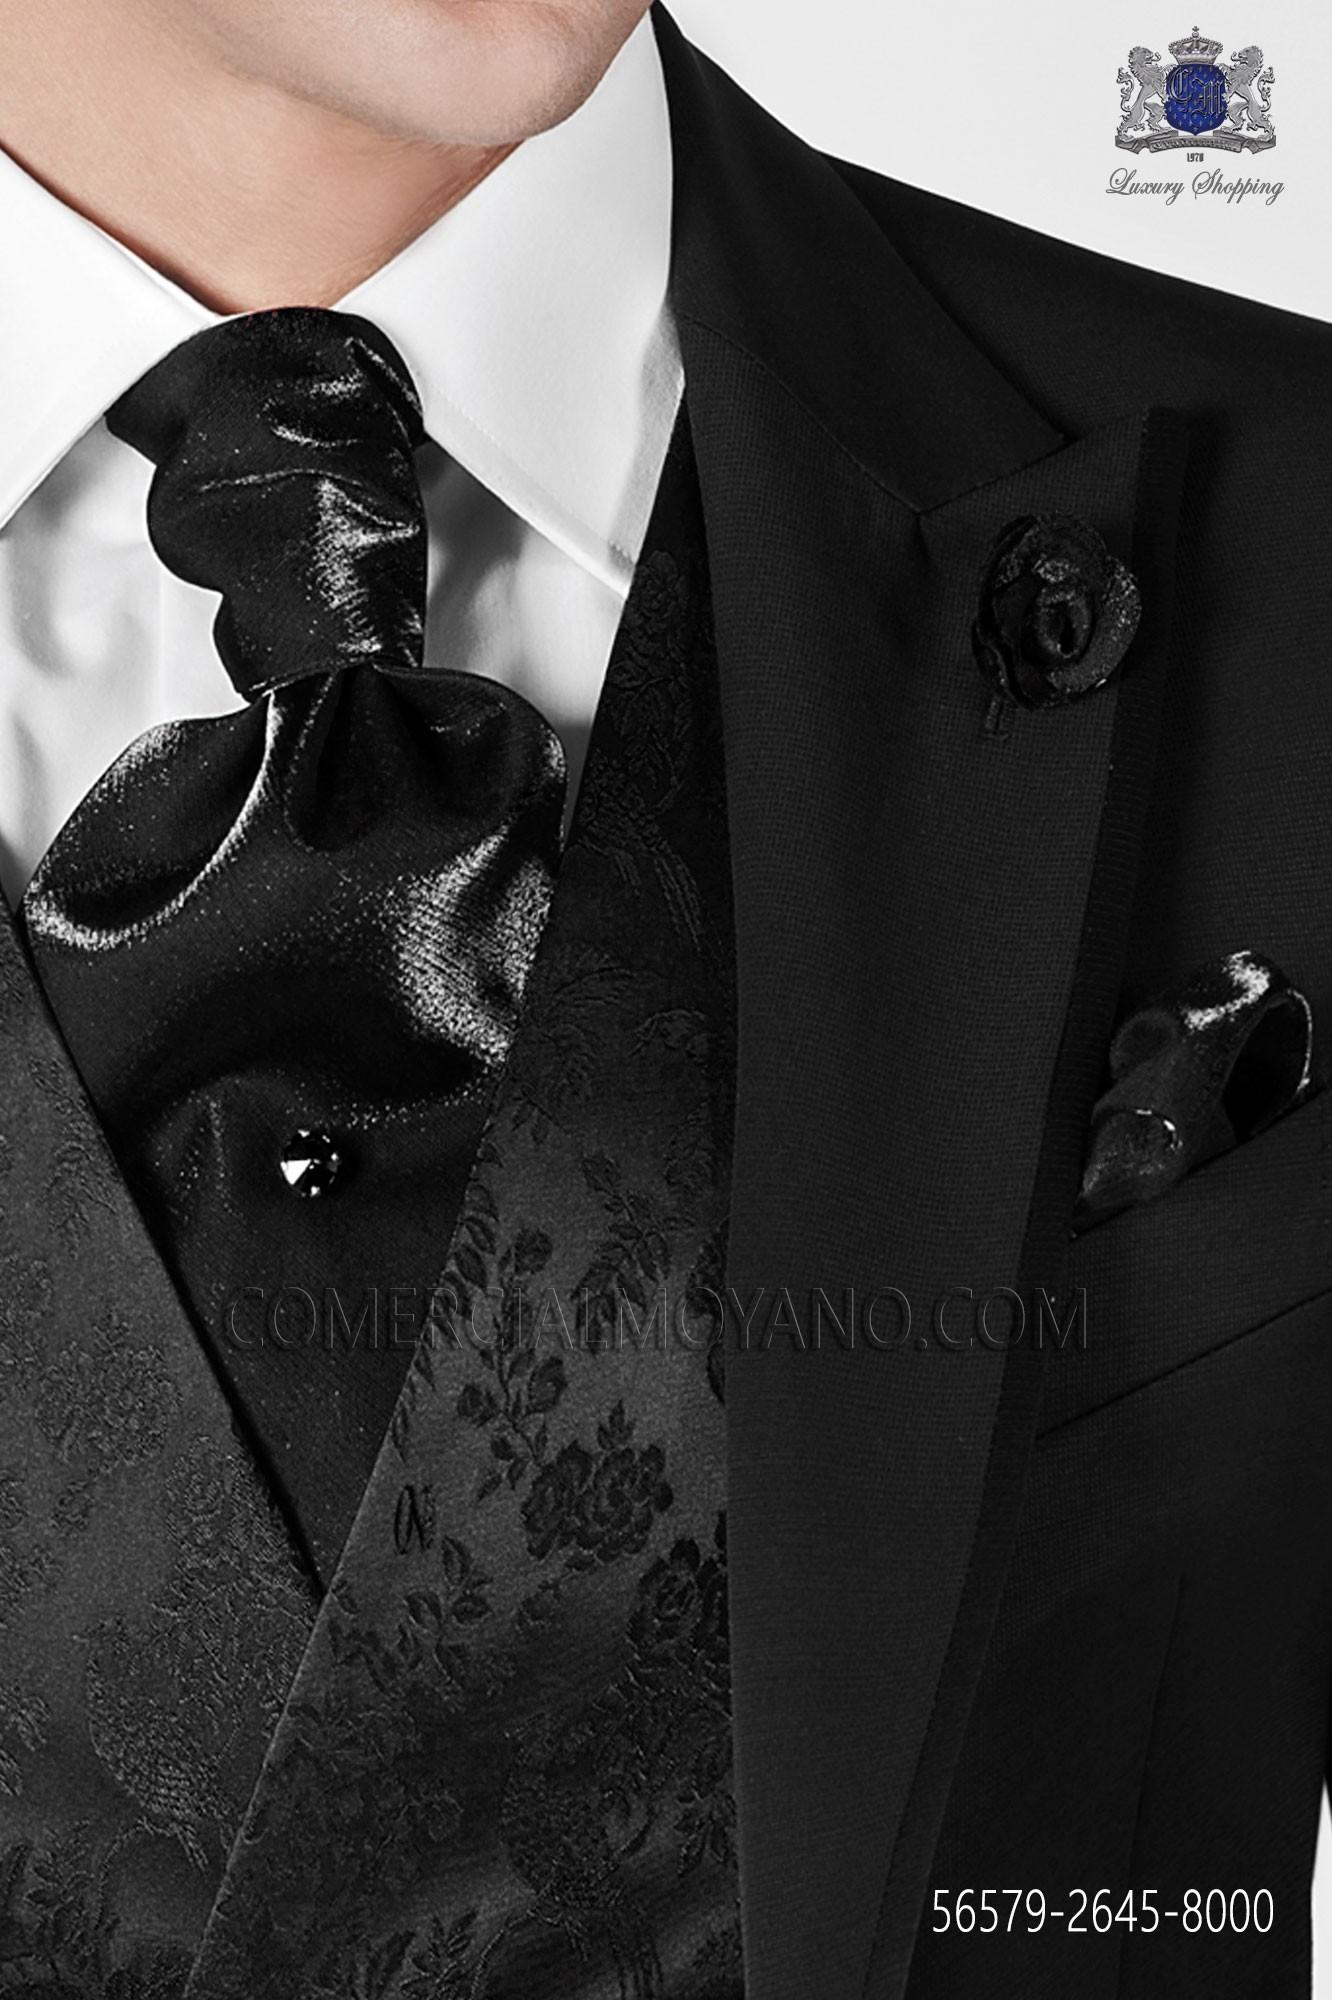 b191fb59c098 Black Lurex Ascot Tie With Handkerchief On